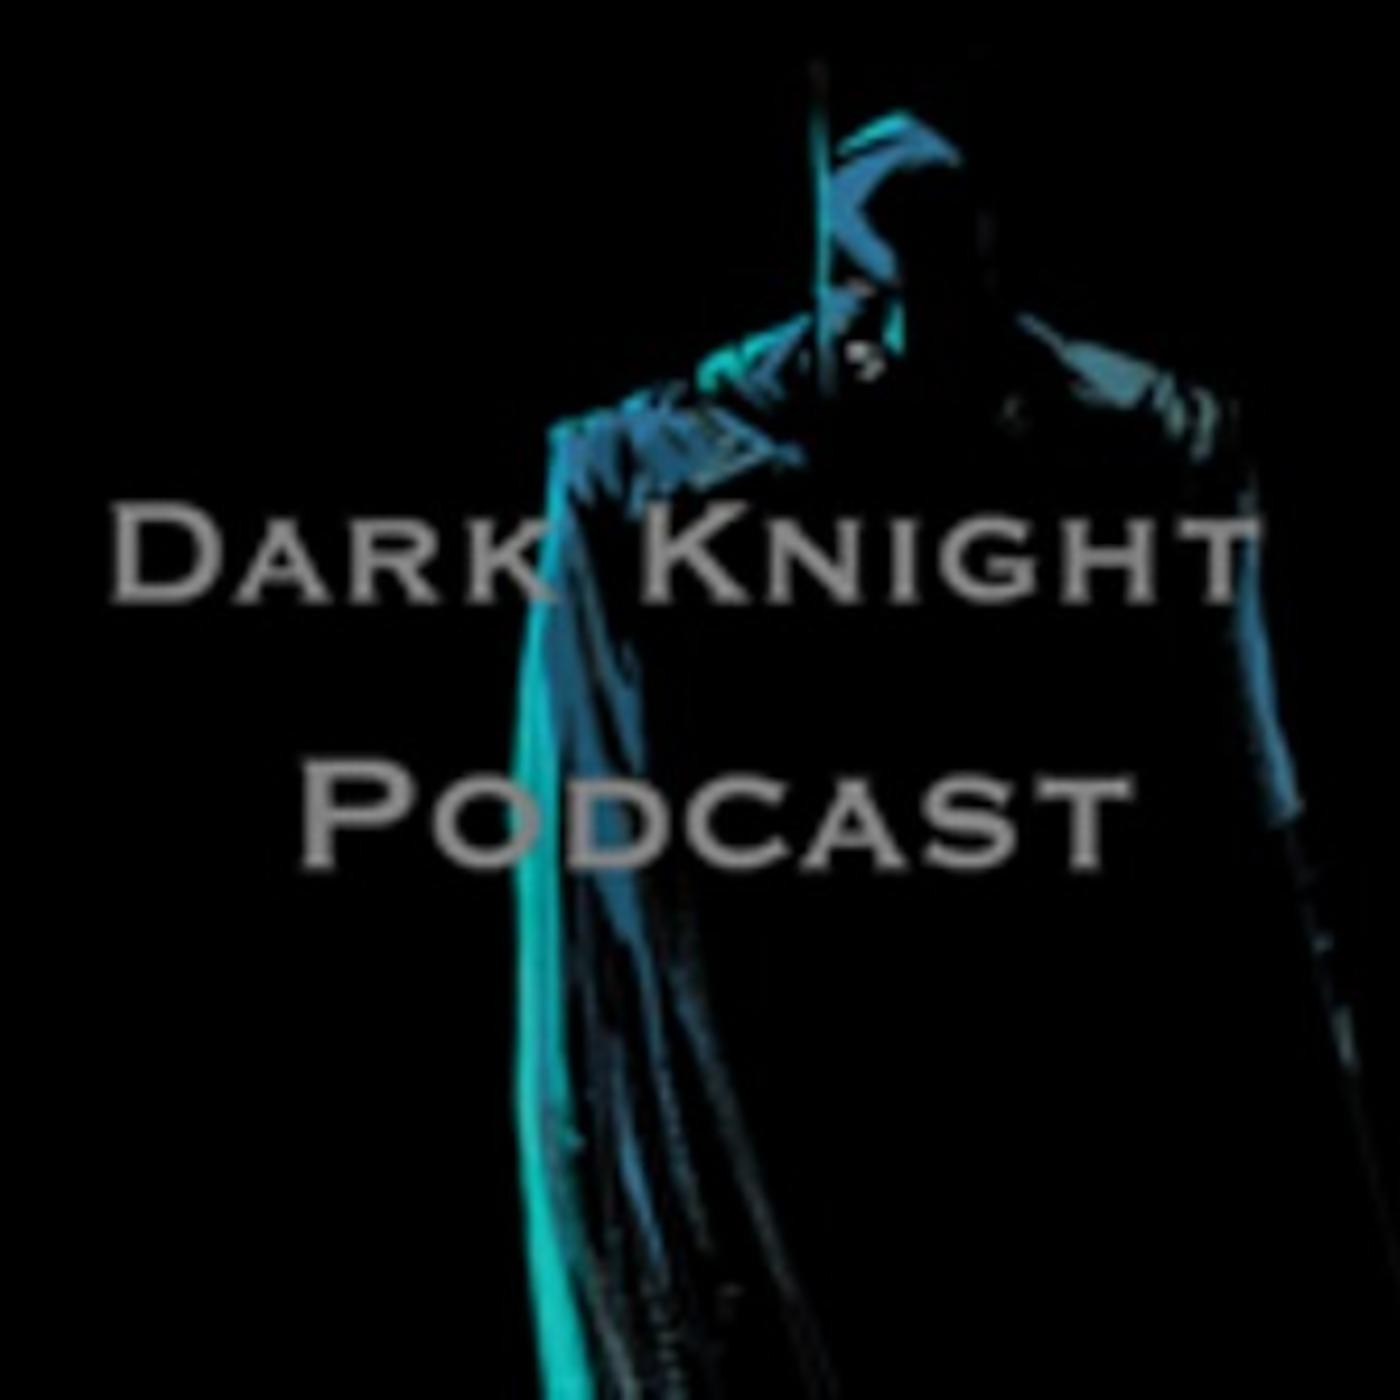 The Dark Knight Podcast!